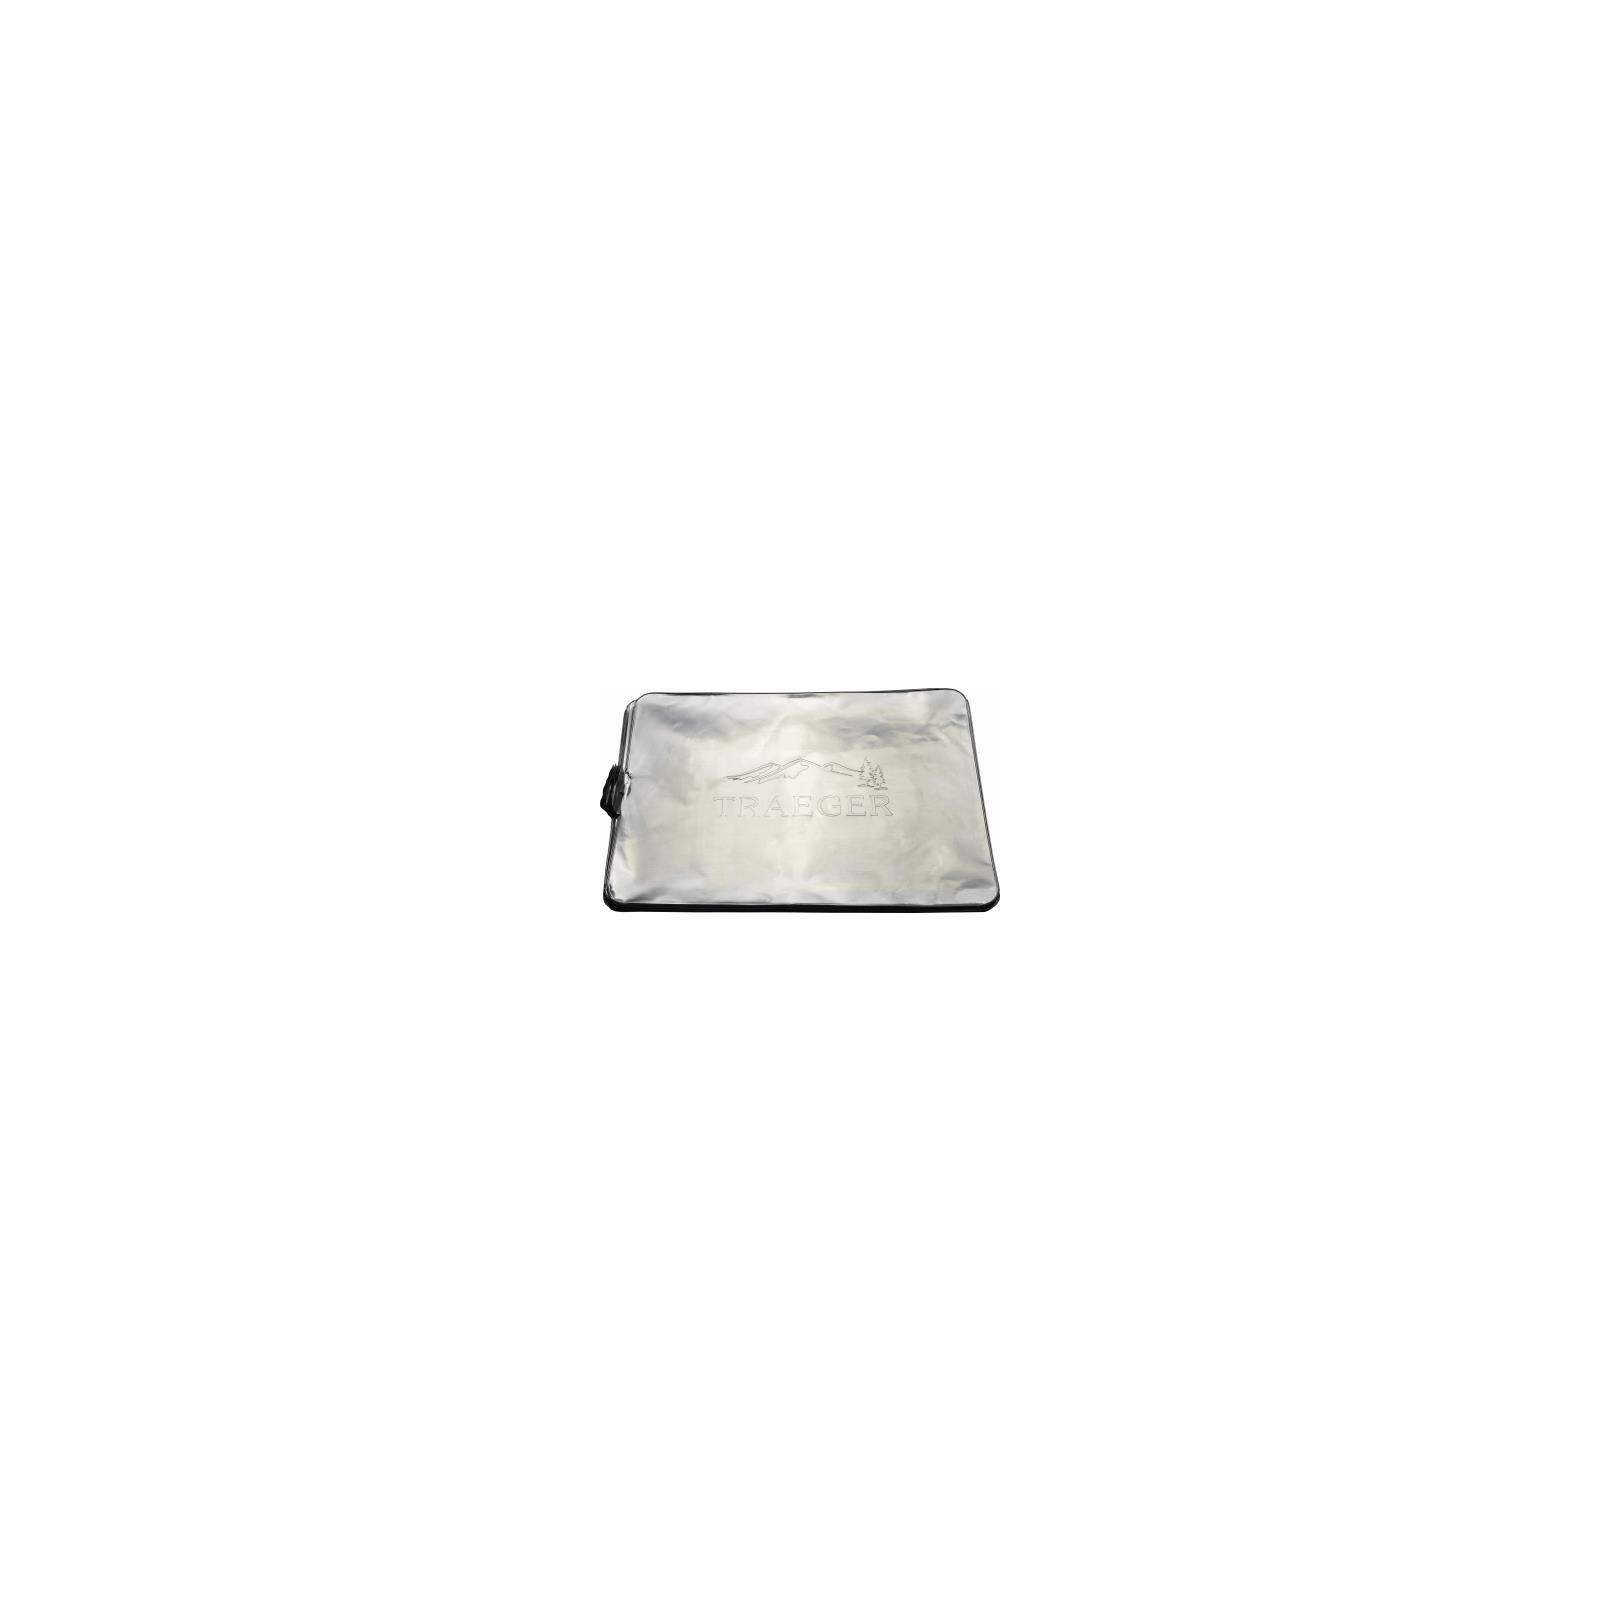 Traeger Pellet Grills BAC408 Pro 20 Series Disposable Drip Tray Liners, 5-Pk. - Quantity 10